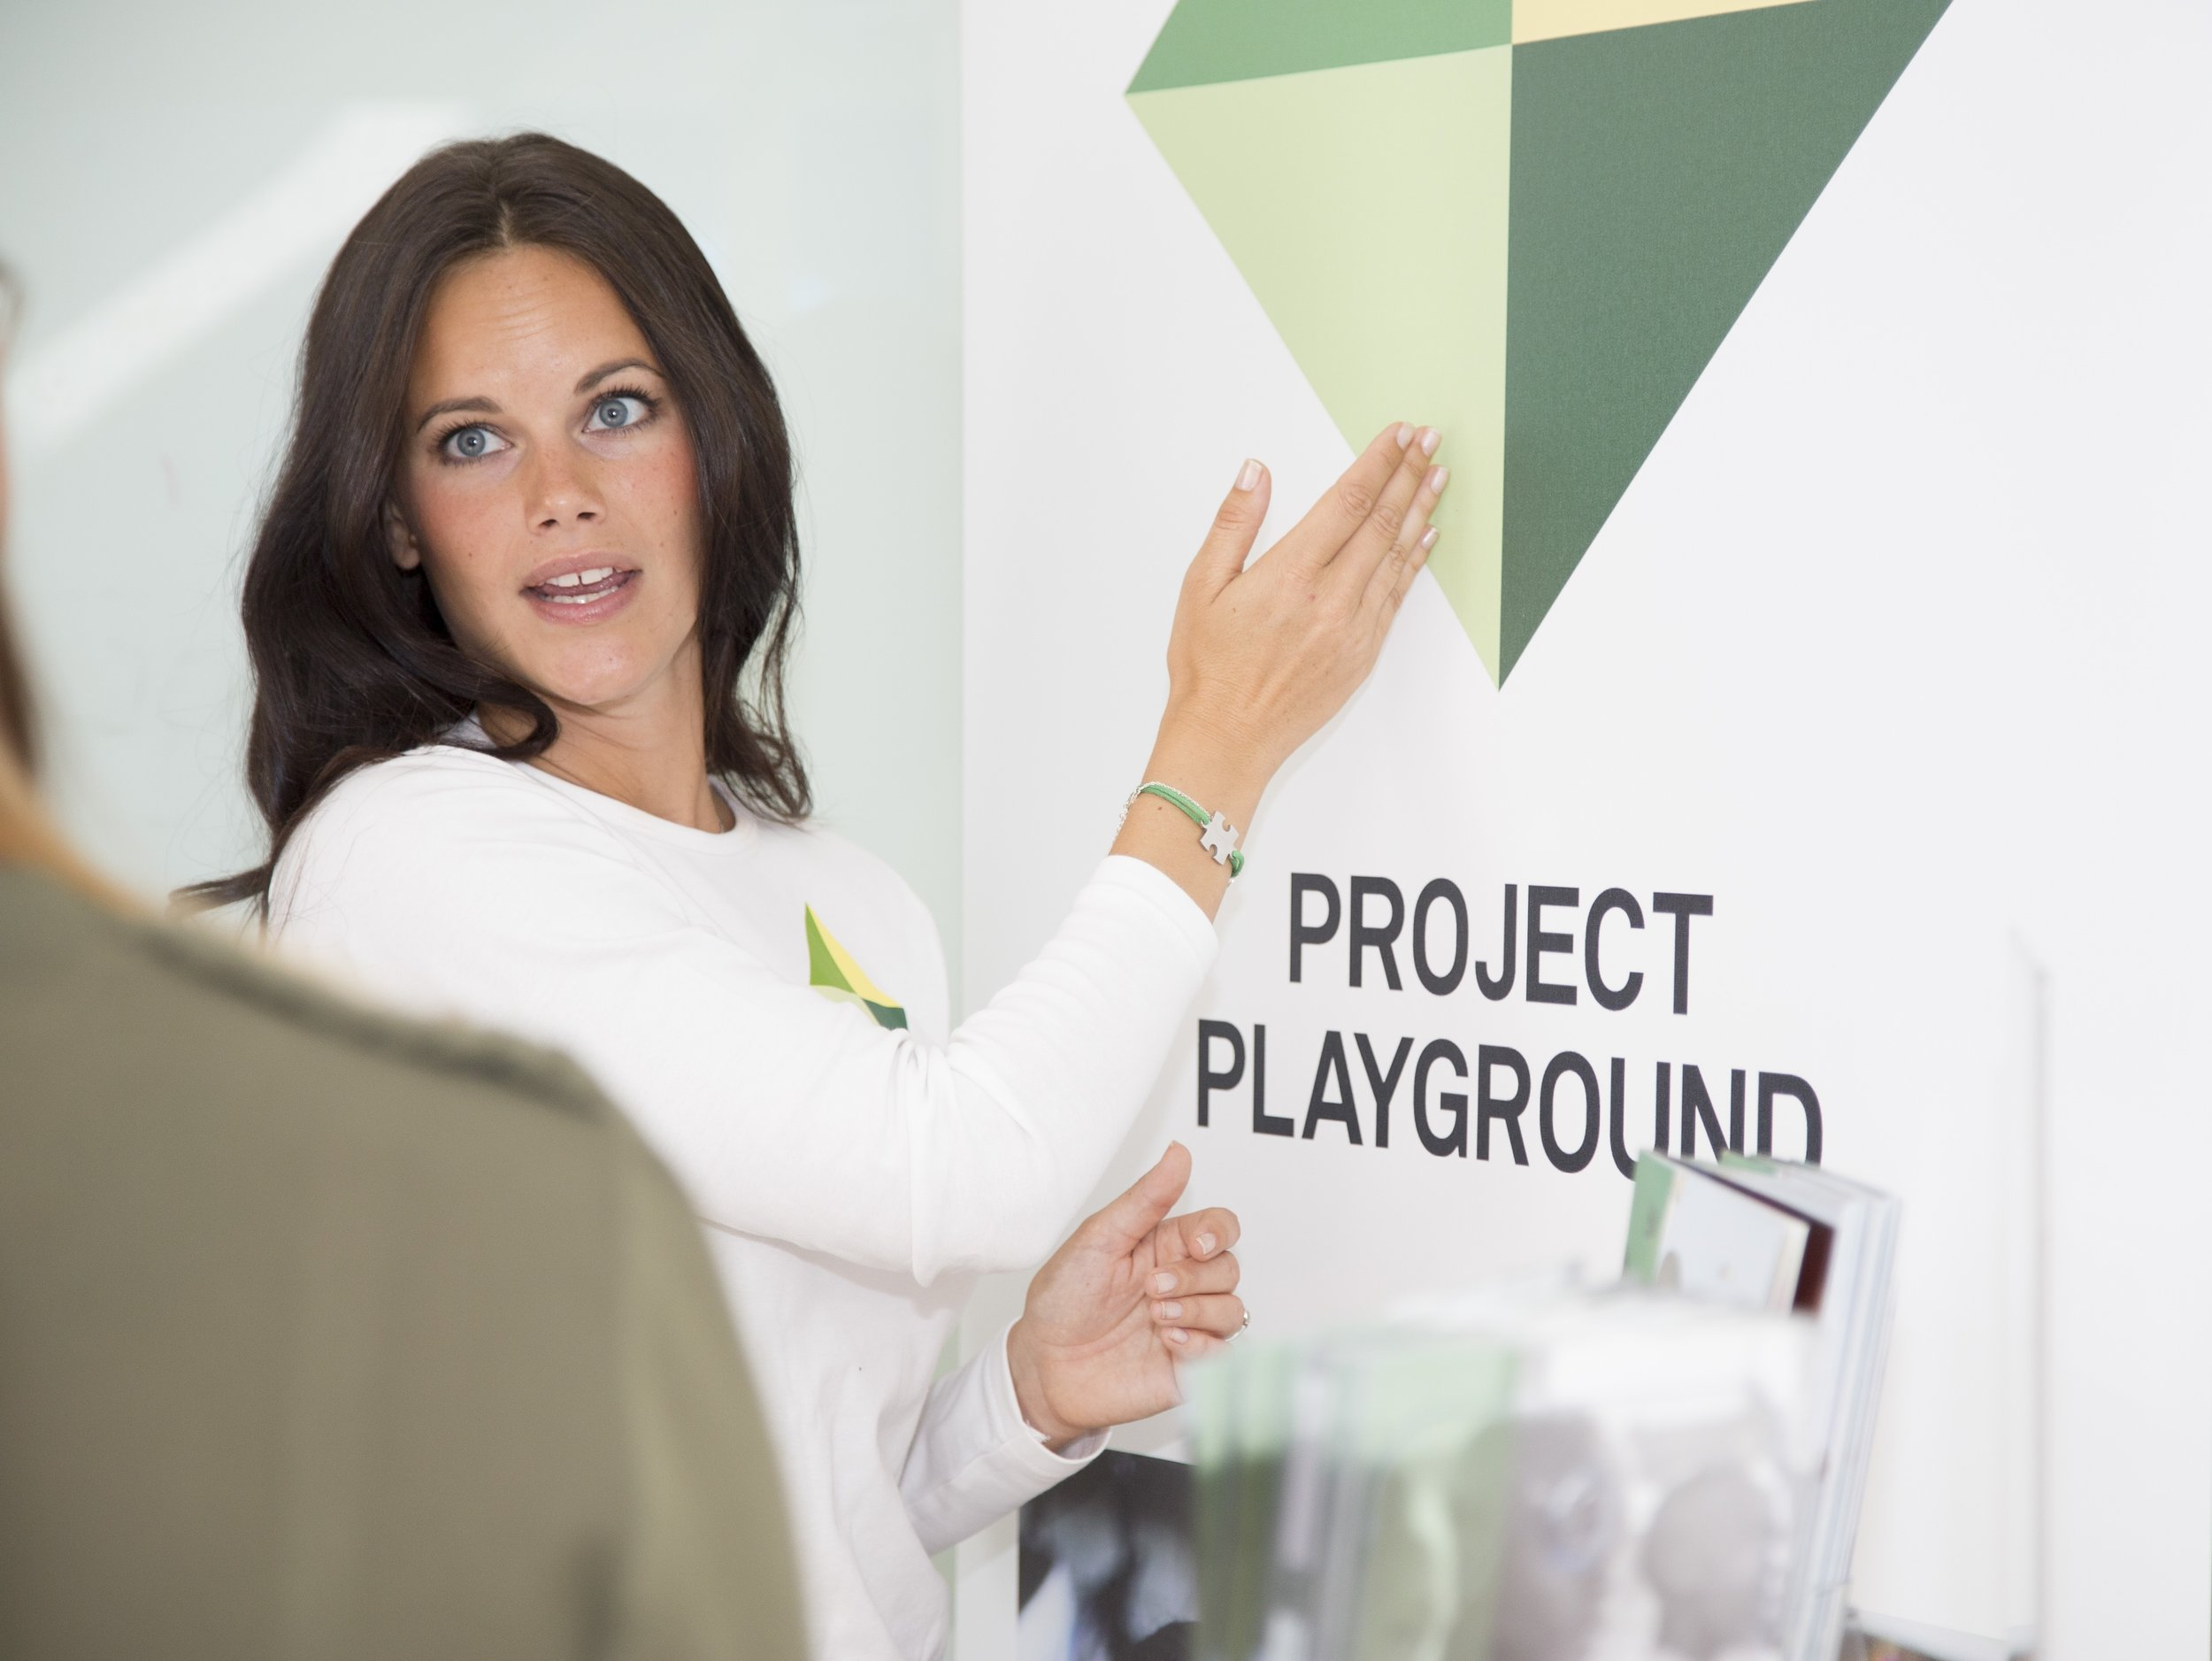 Photo: Project Playground